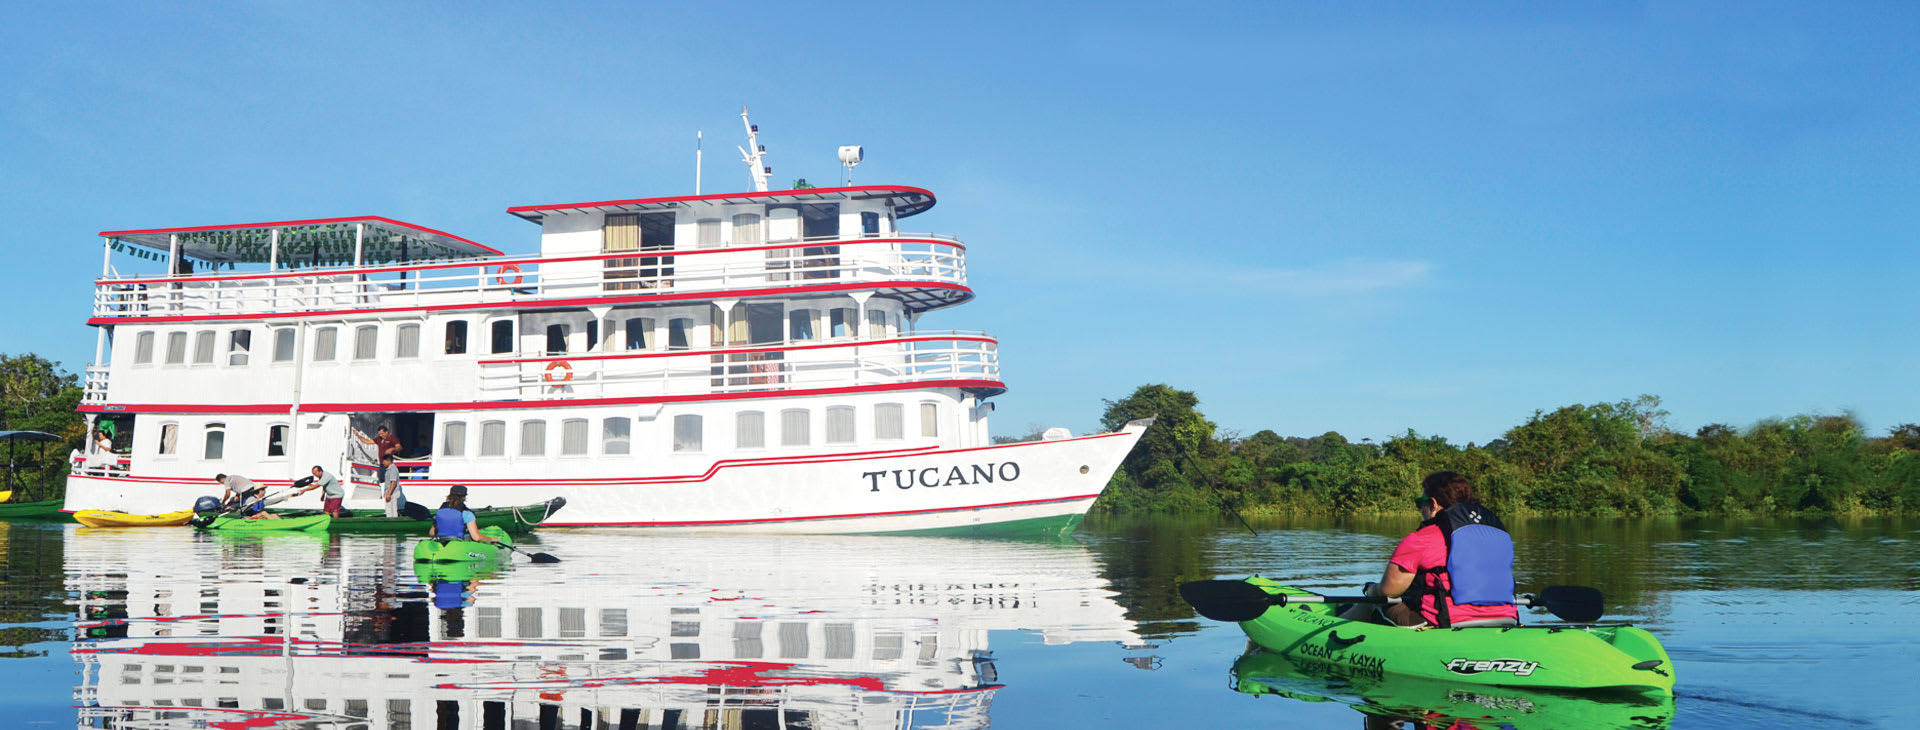 Tucano and kayaks